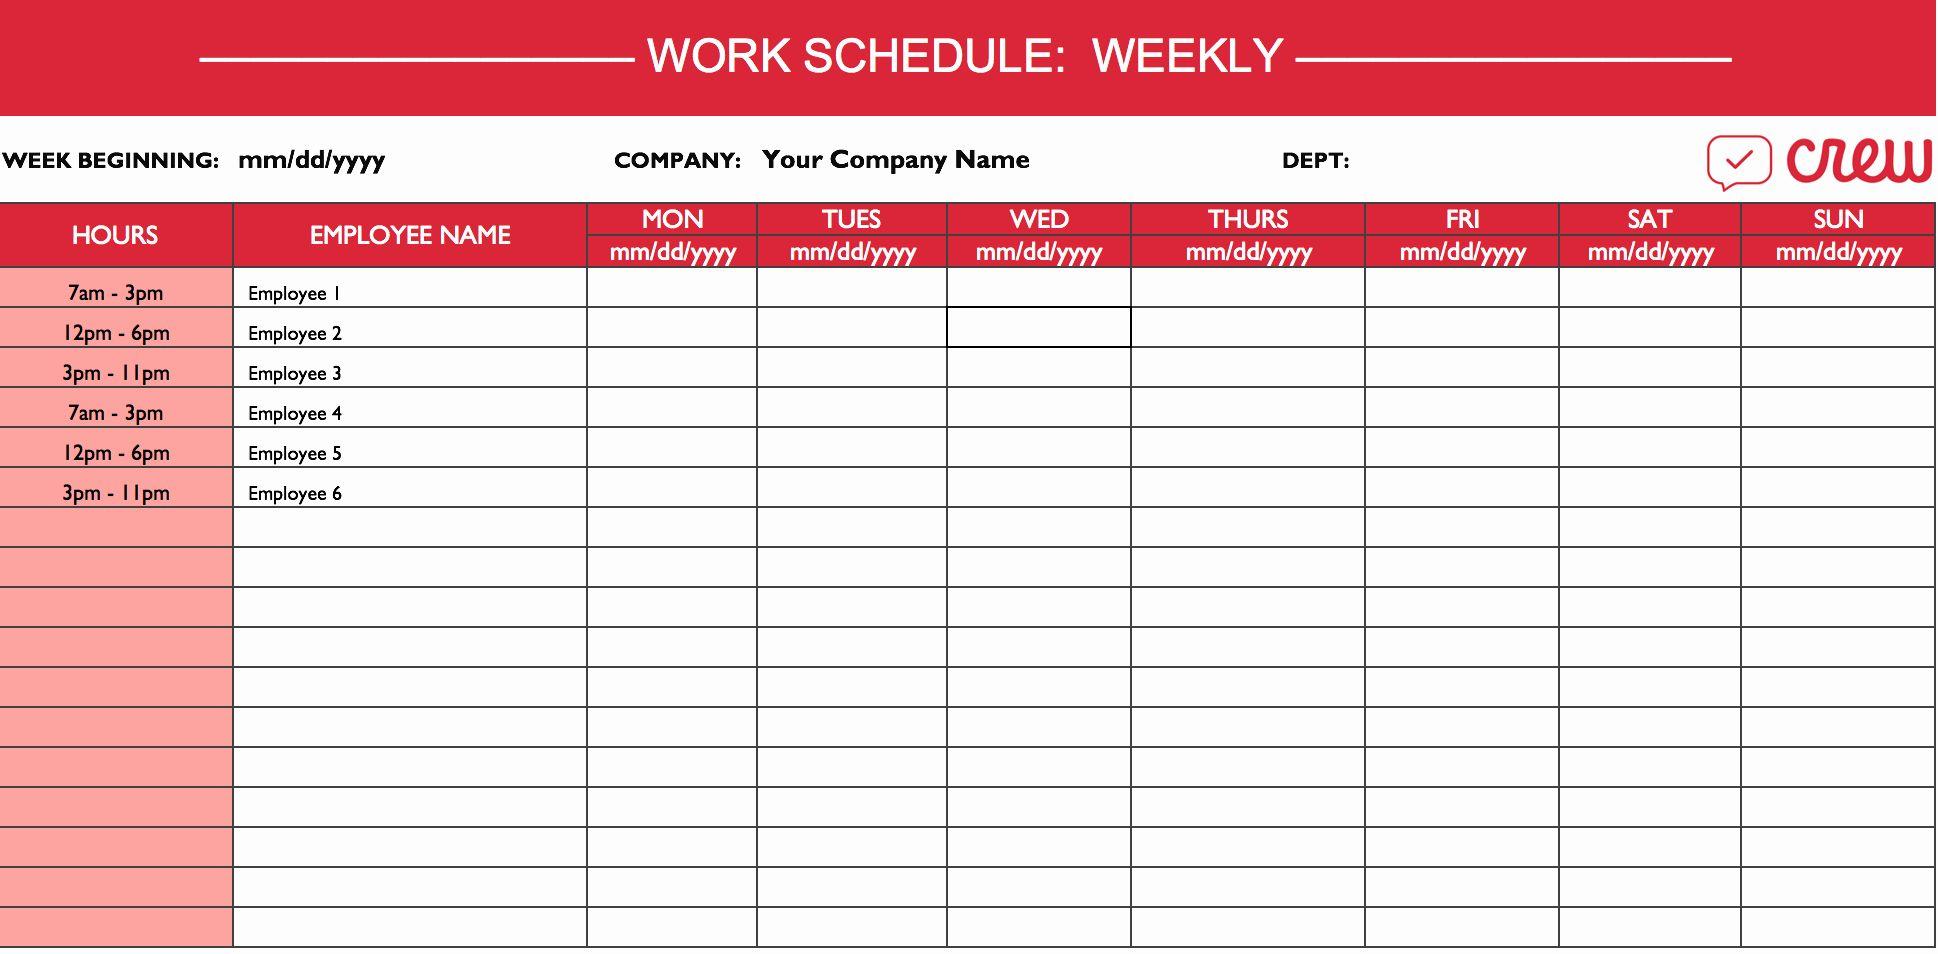 Work Schedule Template Free Best Of Weekly Work Schedule Template I Crew In 2020 Monthly Schedule Template Daily Schedule Template Schedule Templates